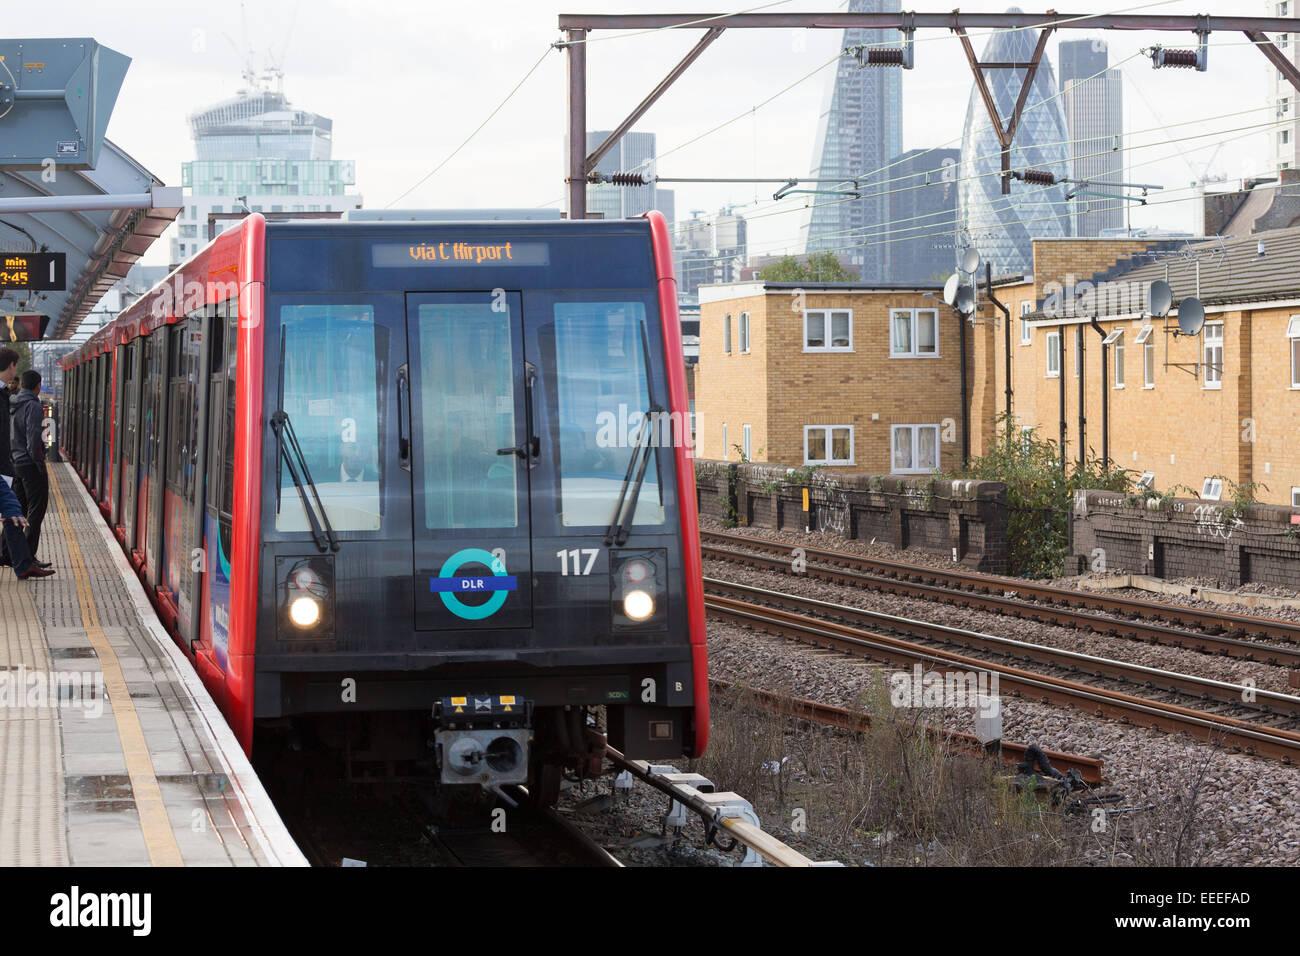 Docklands Light Railway train with London skyline - Stock Image